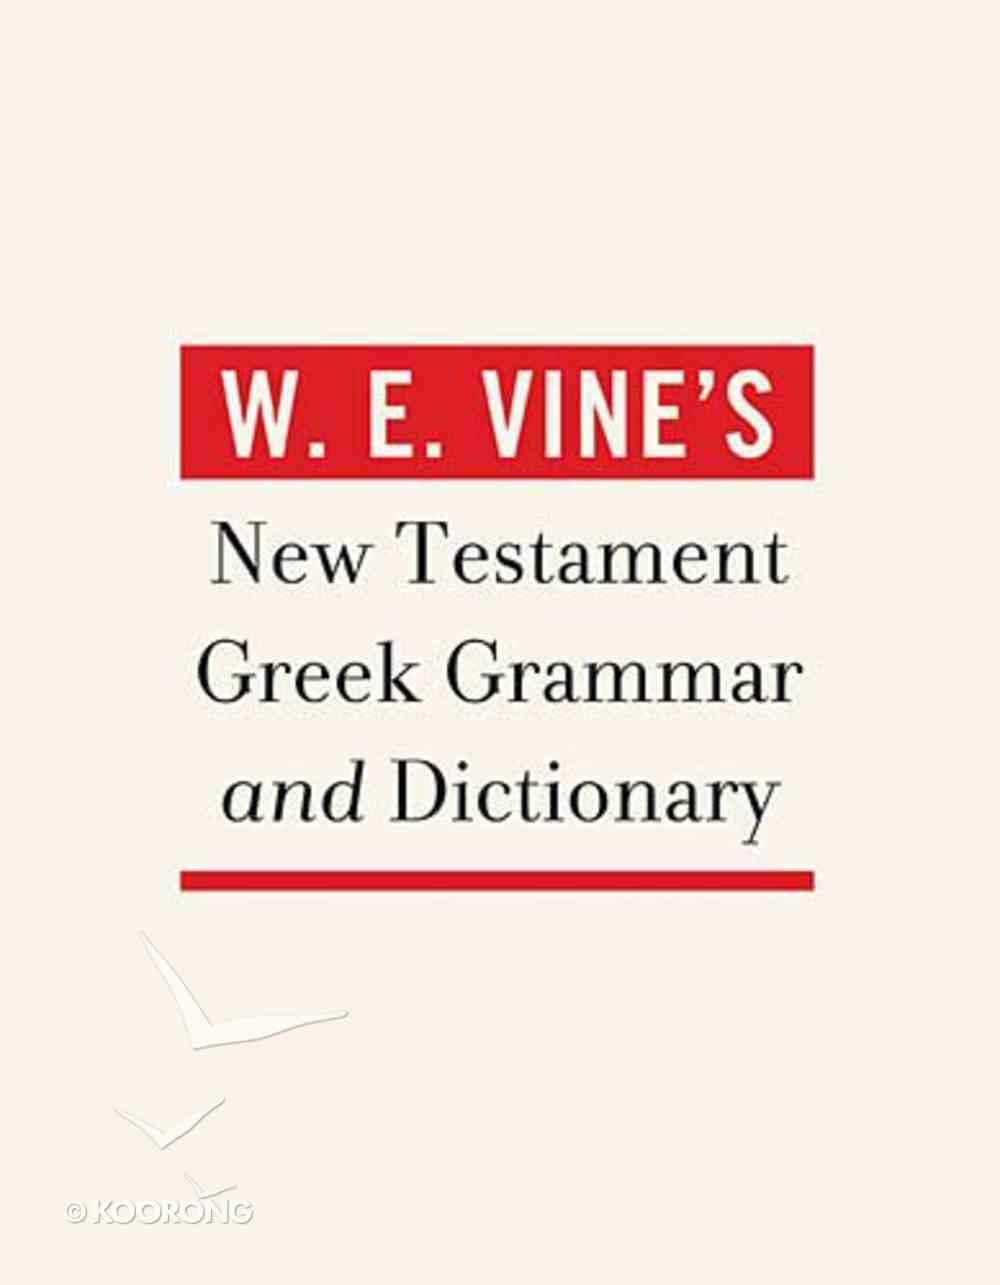 W.E Vine's New Testament Greek Grammar and Dictionary Hardback